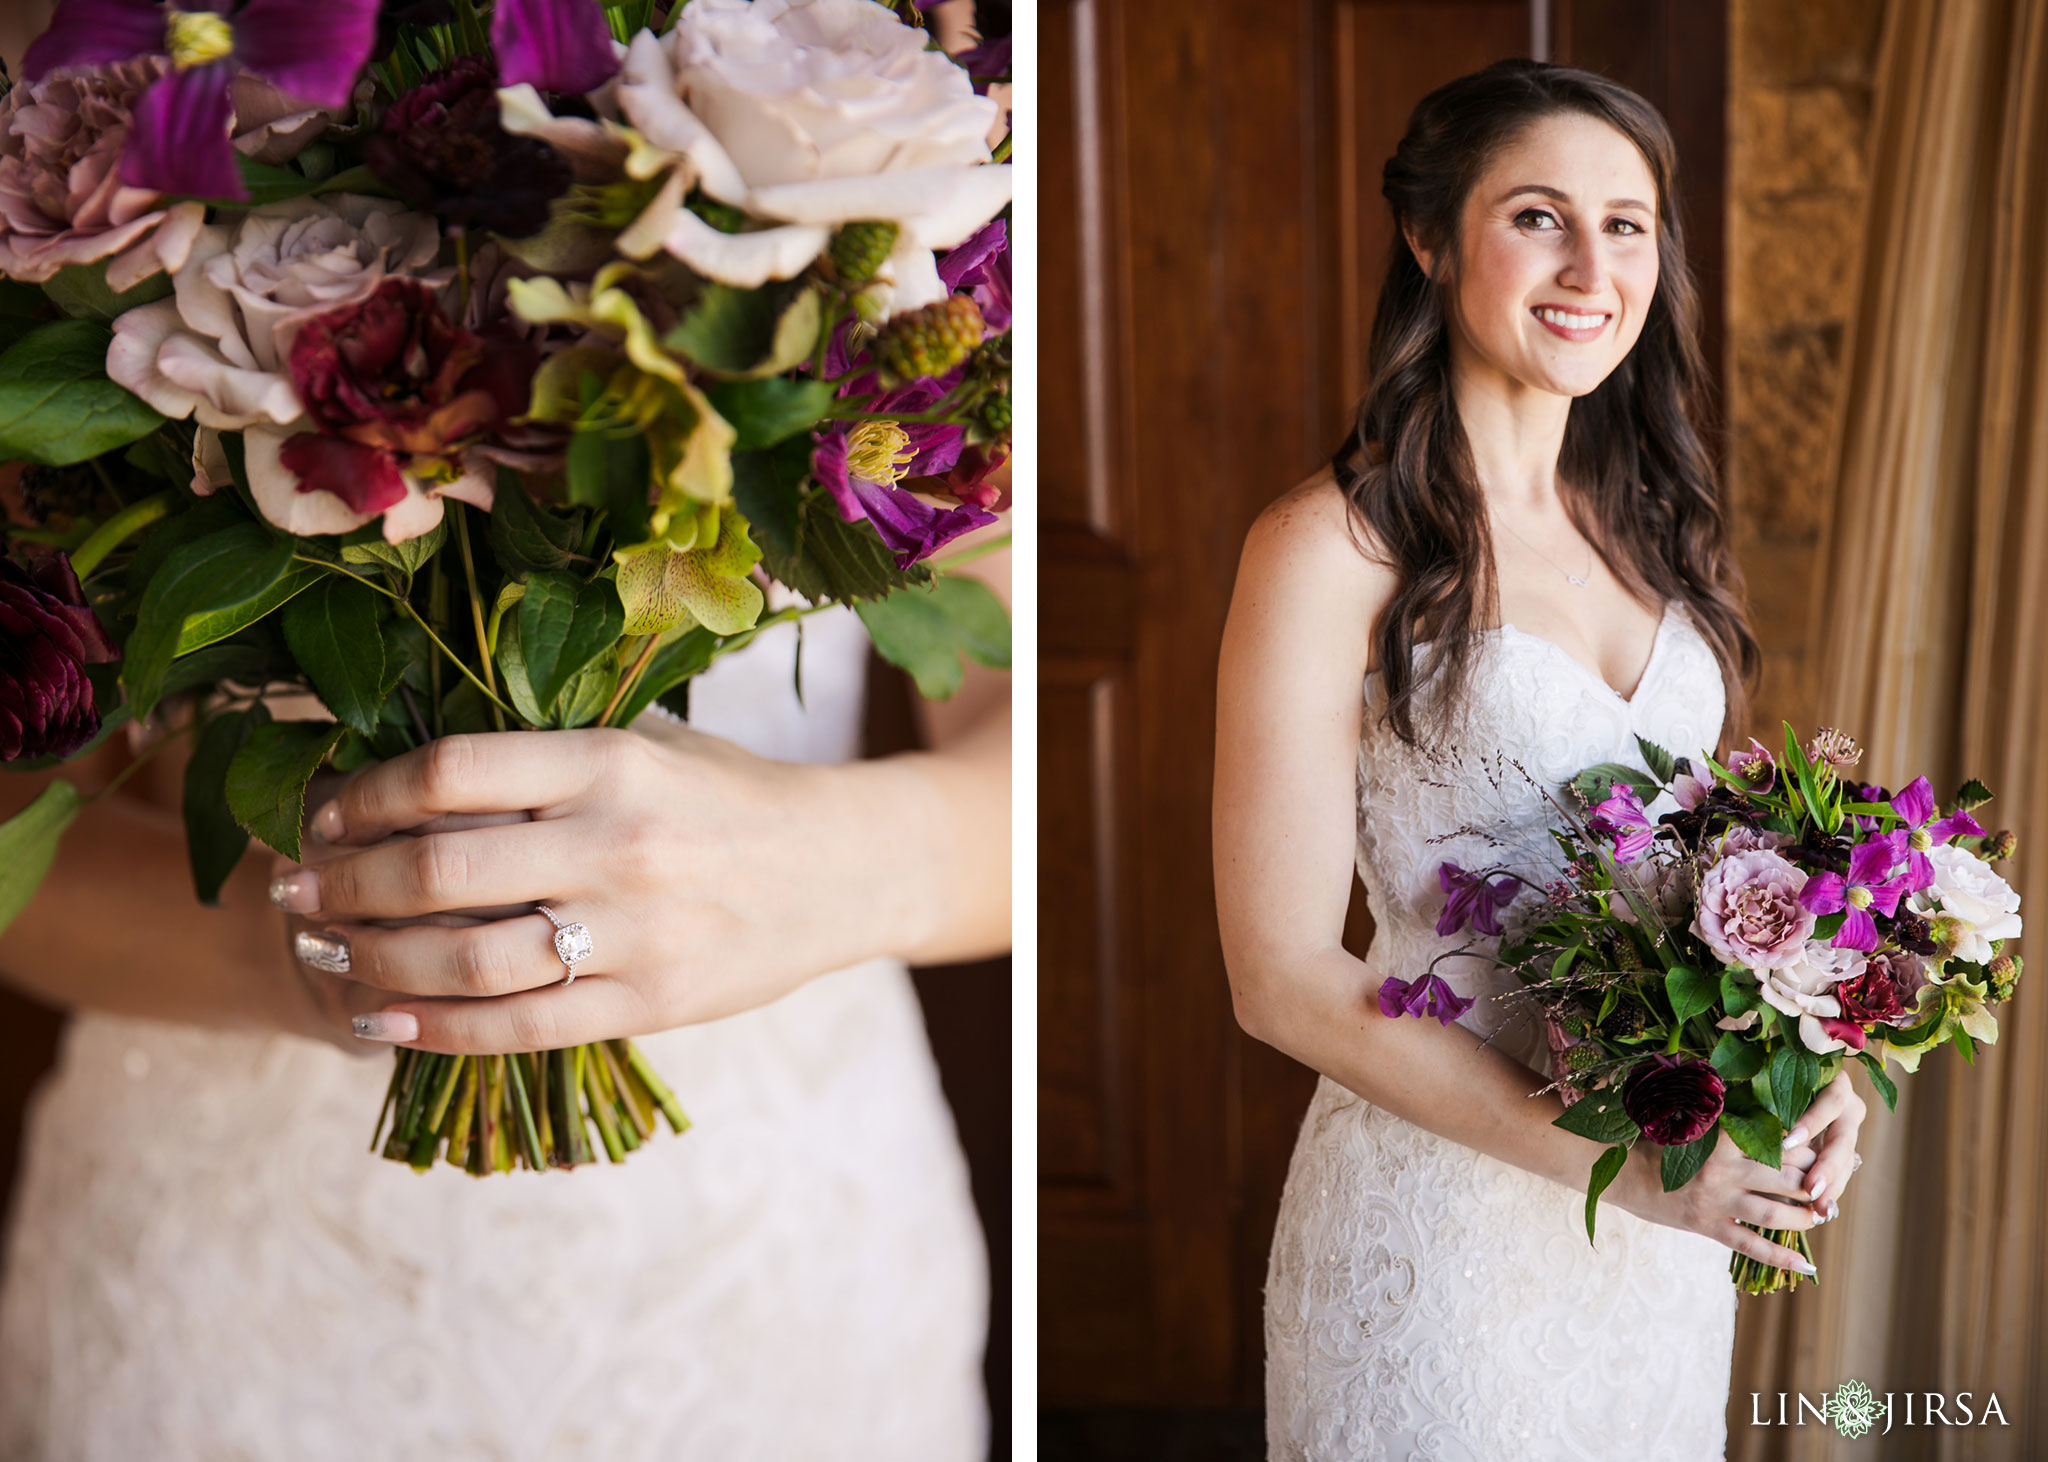 003 malibu rocky oaks wedding photography